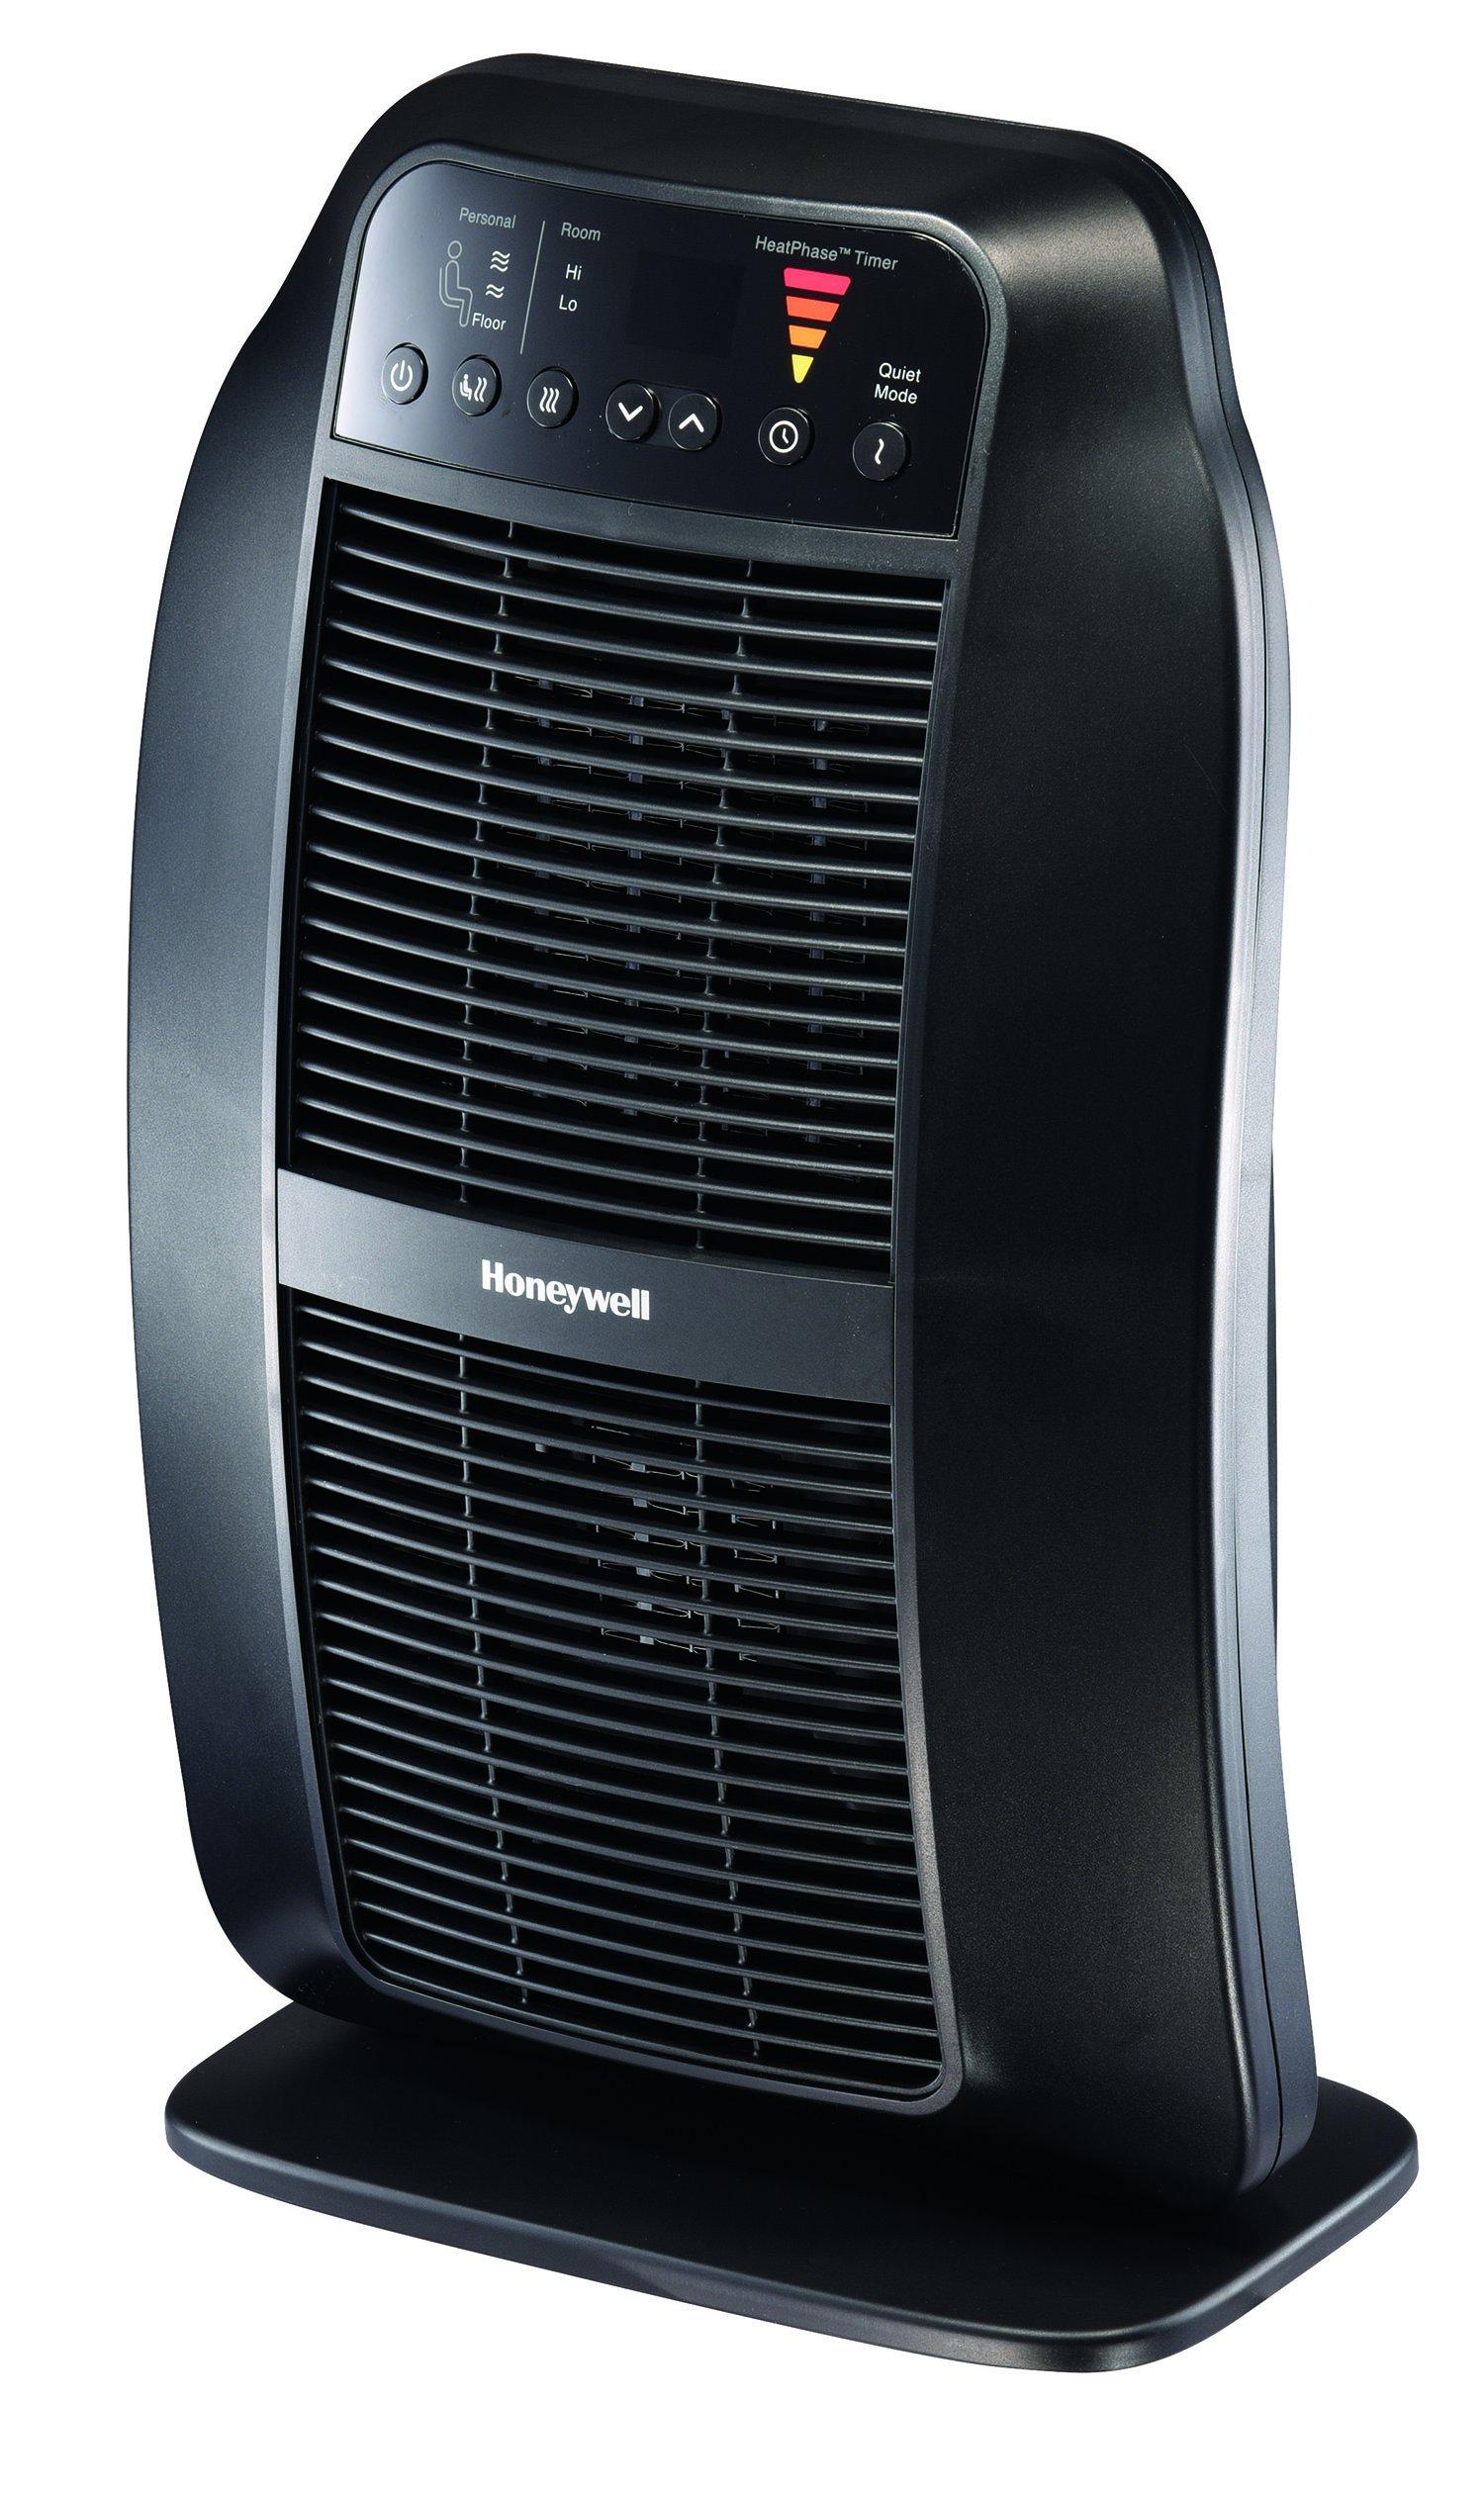 Honeywell HCE840B Heat Genius Ceramic Heater, Black